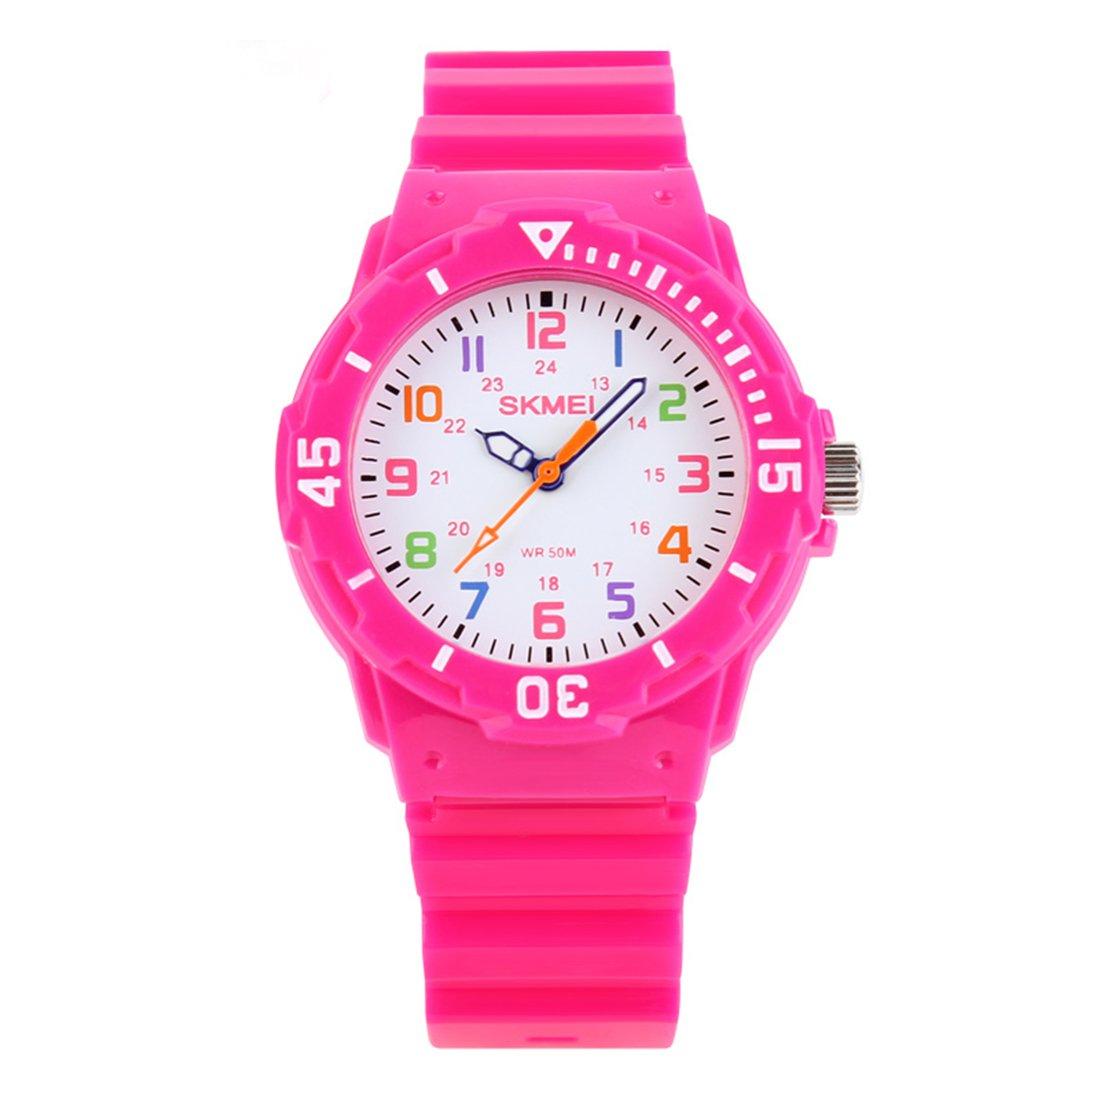 Kids 50M Waterproof Watch,PU Band Wrist Watch for Boys Girls, Pink